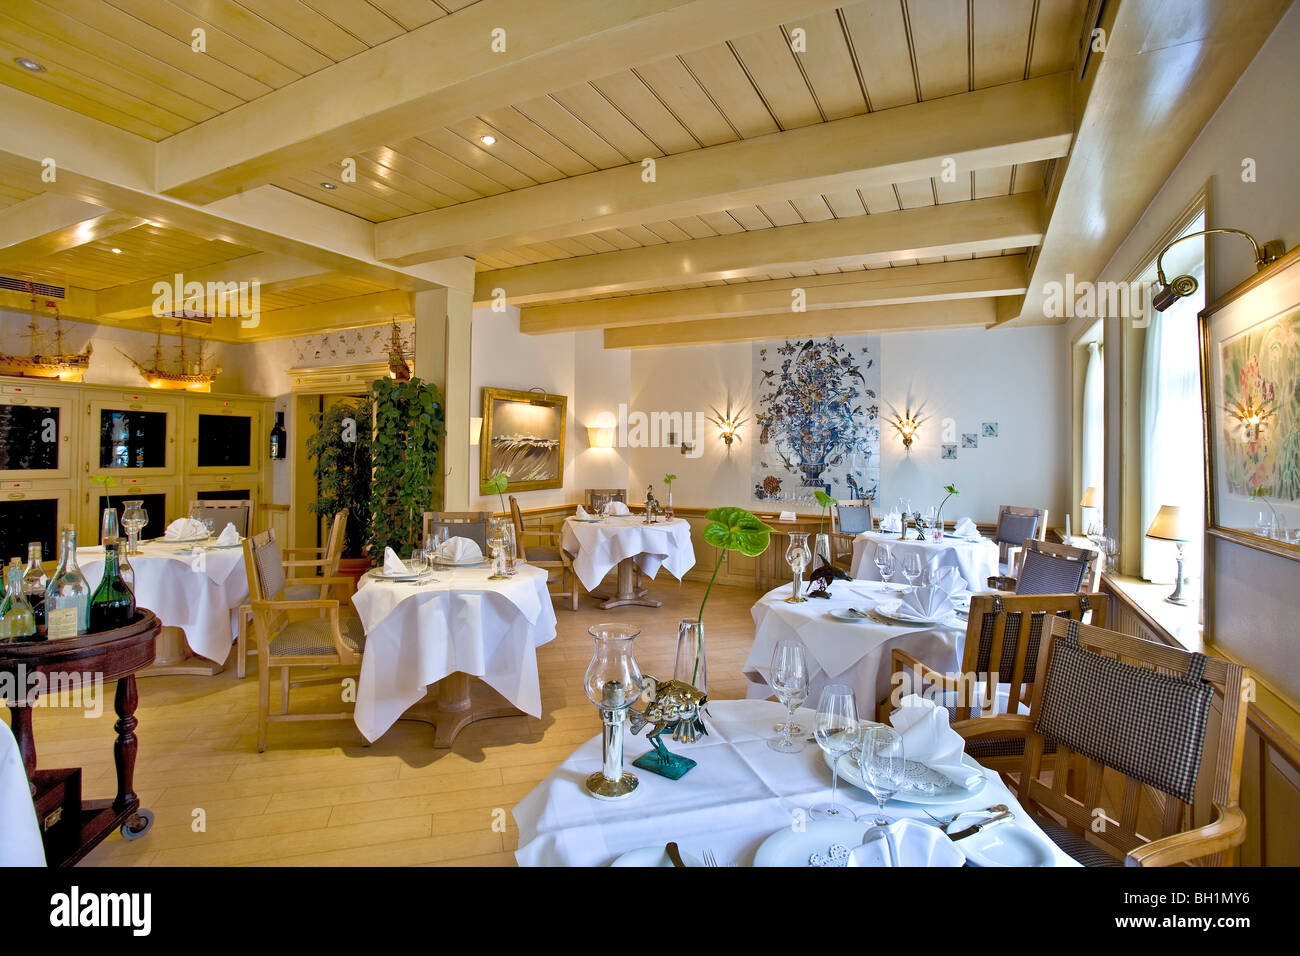 Joerg Mueller Restaurant, Westerland, Sylt Island, North Frisian Islands, Schleswig-Holstein, Germany - Stock Image